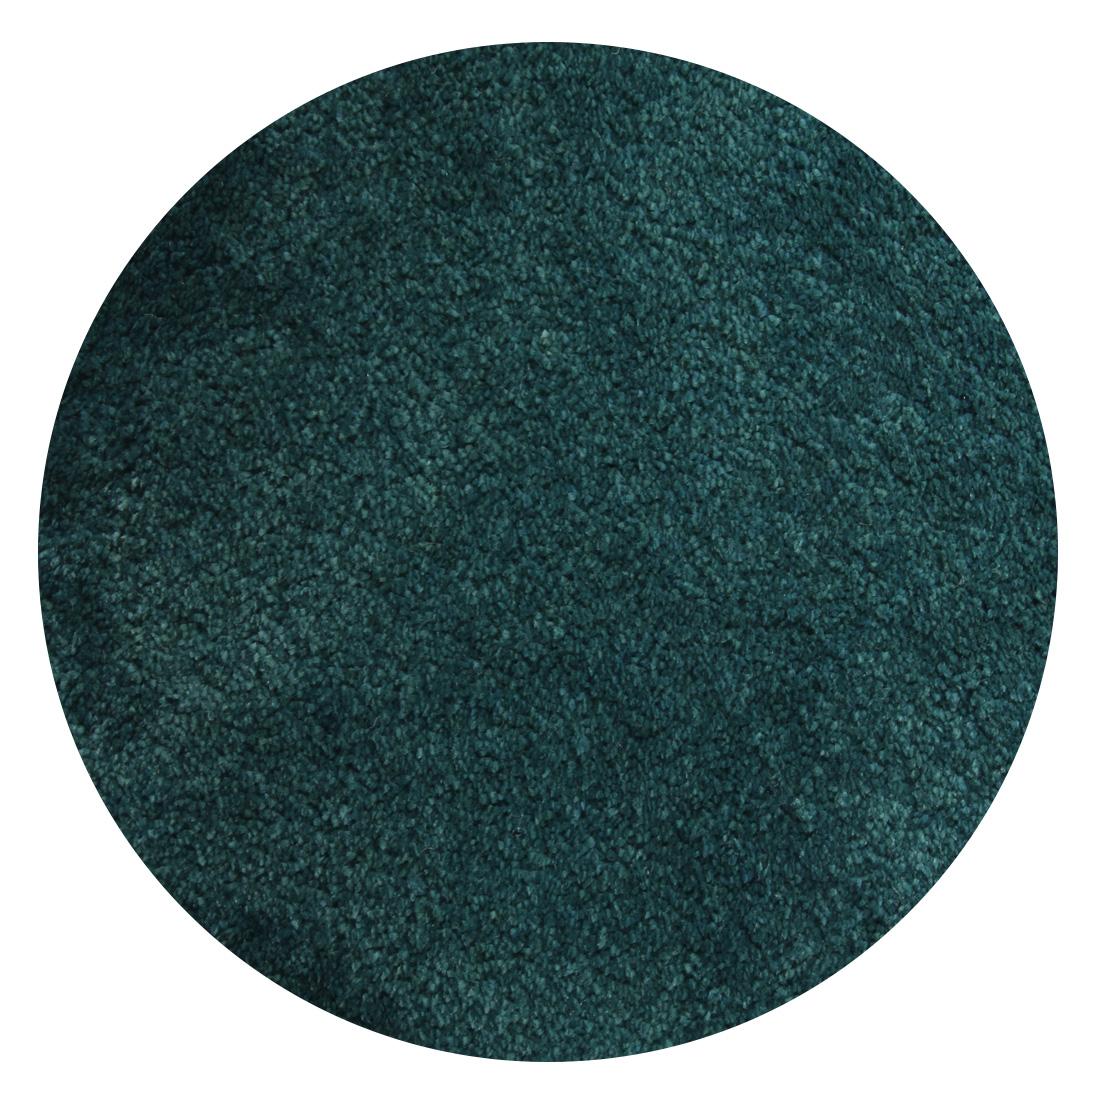 Rond Vloerkleed Xilento Touch Azure Green (extra zacht)